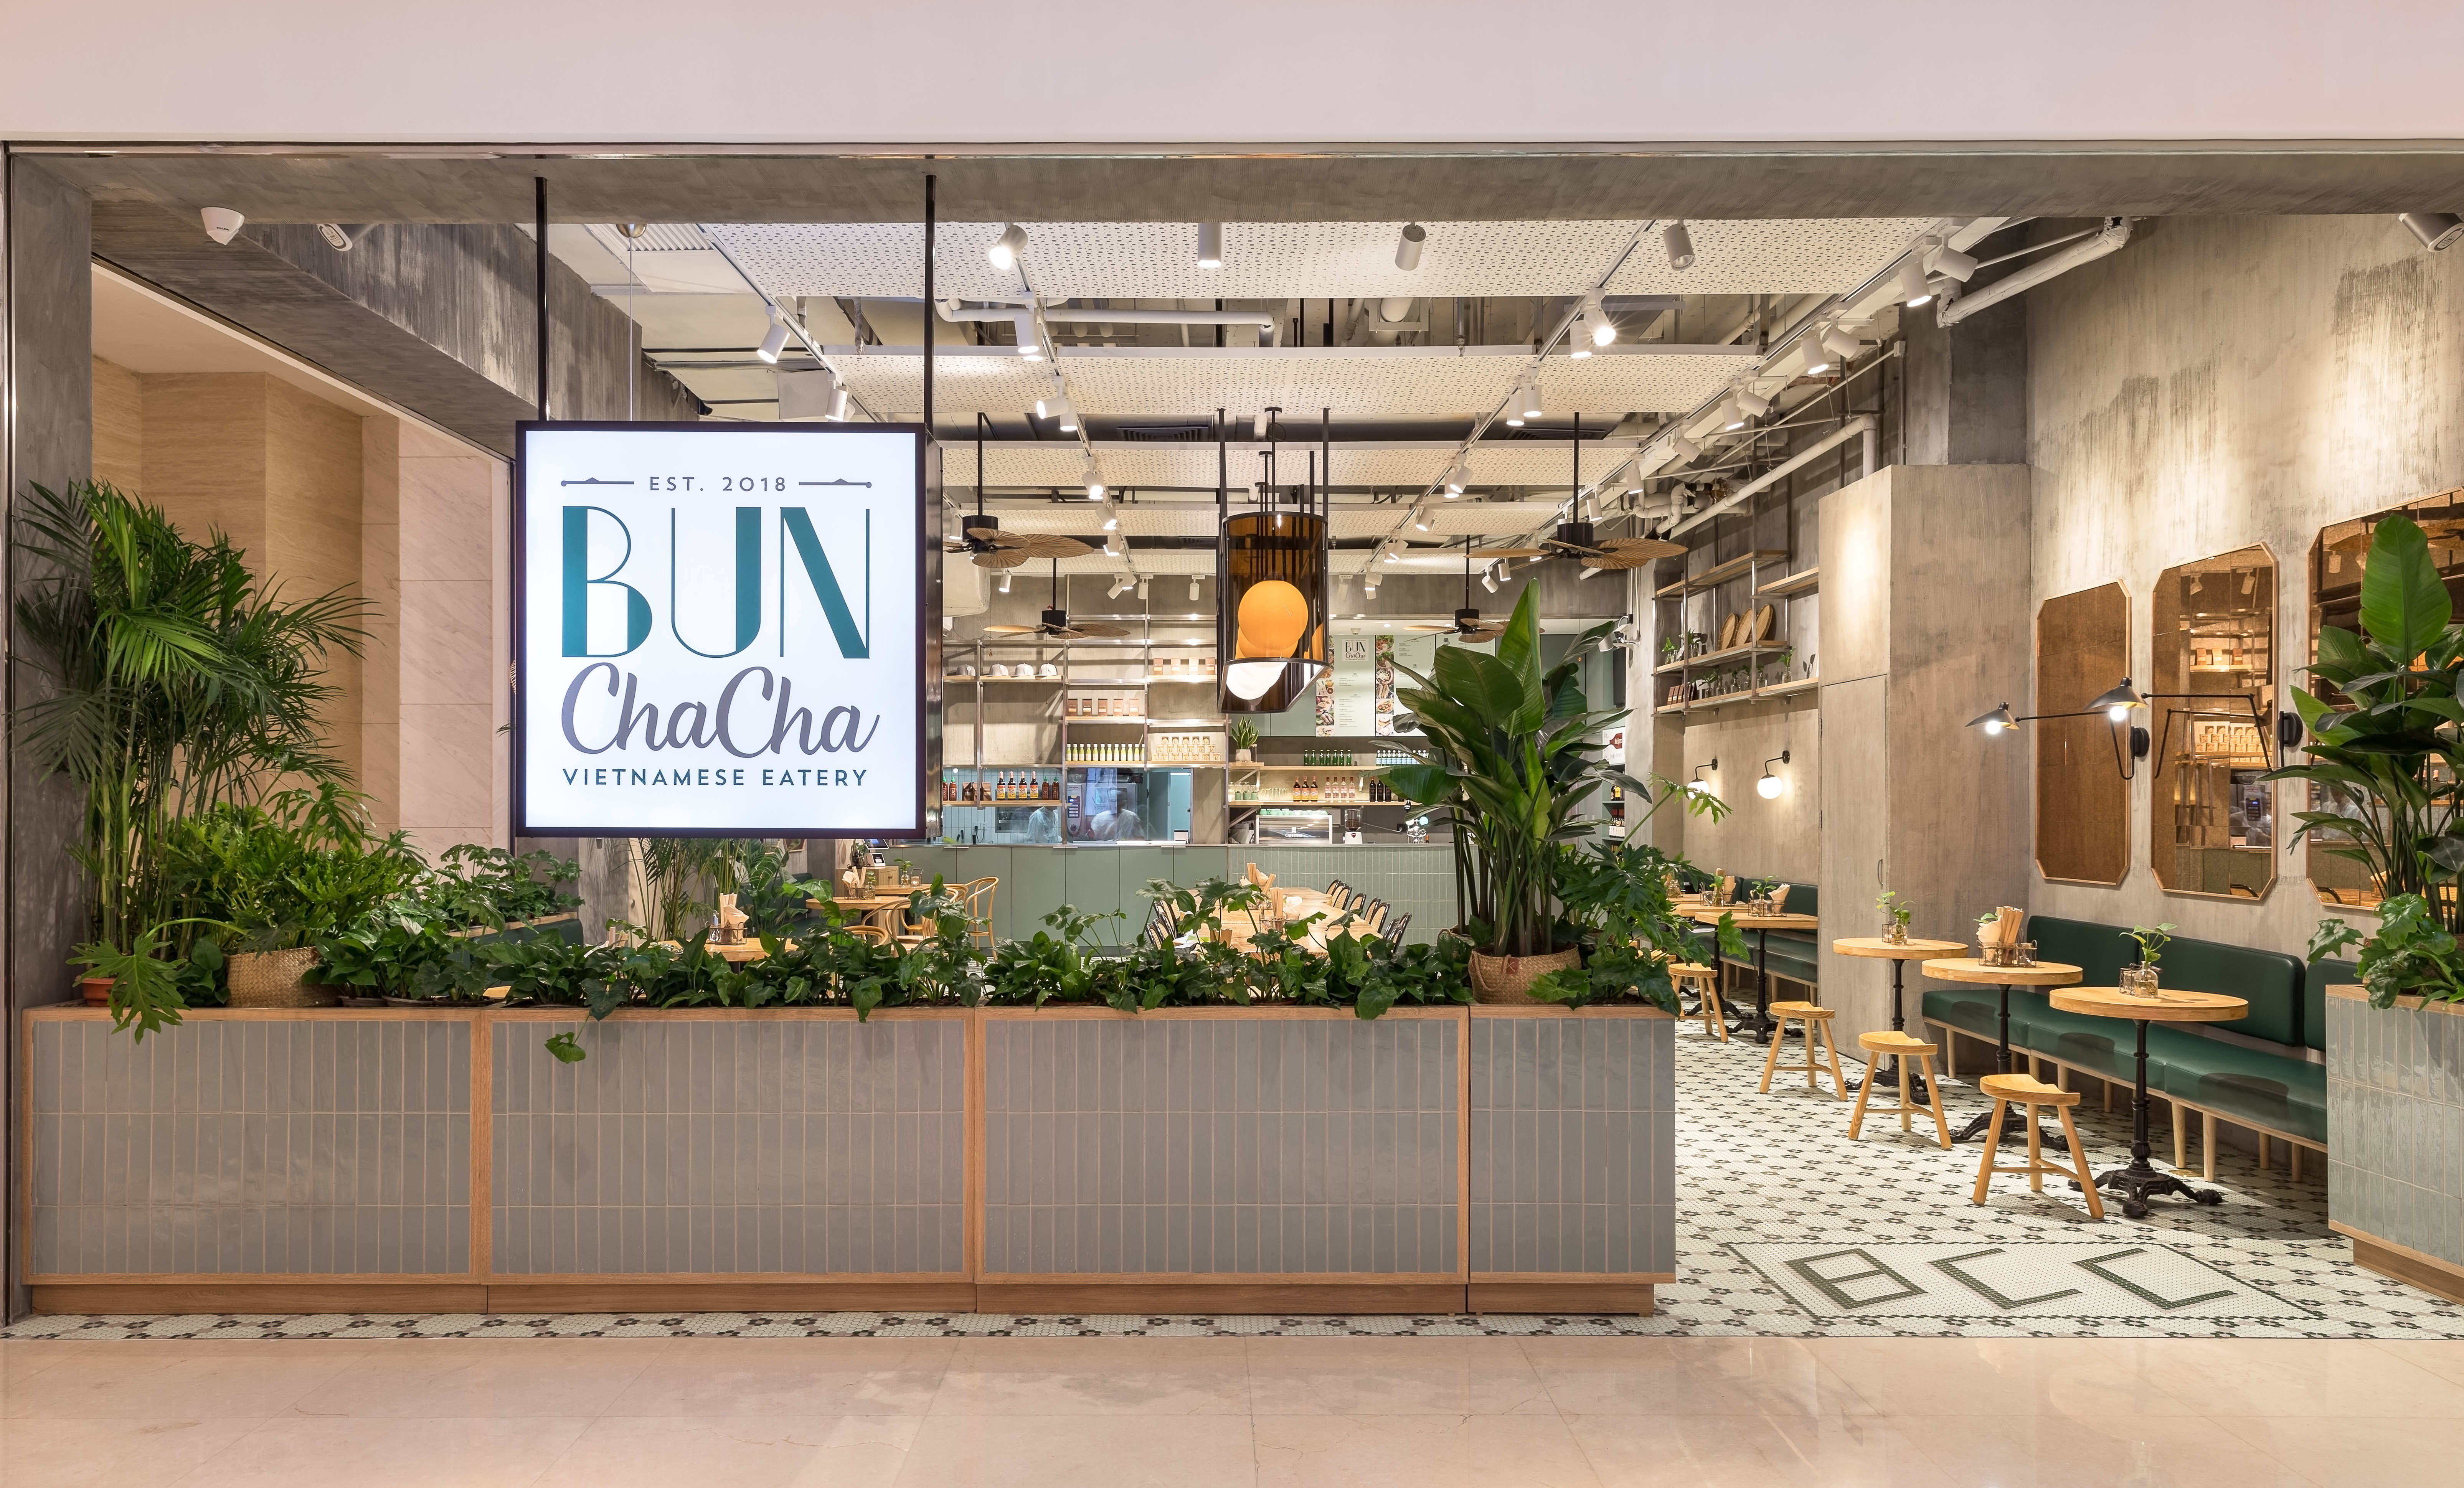 Bun Cha Cha Shanghai hcreates